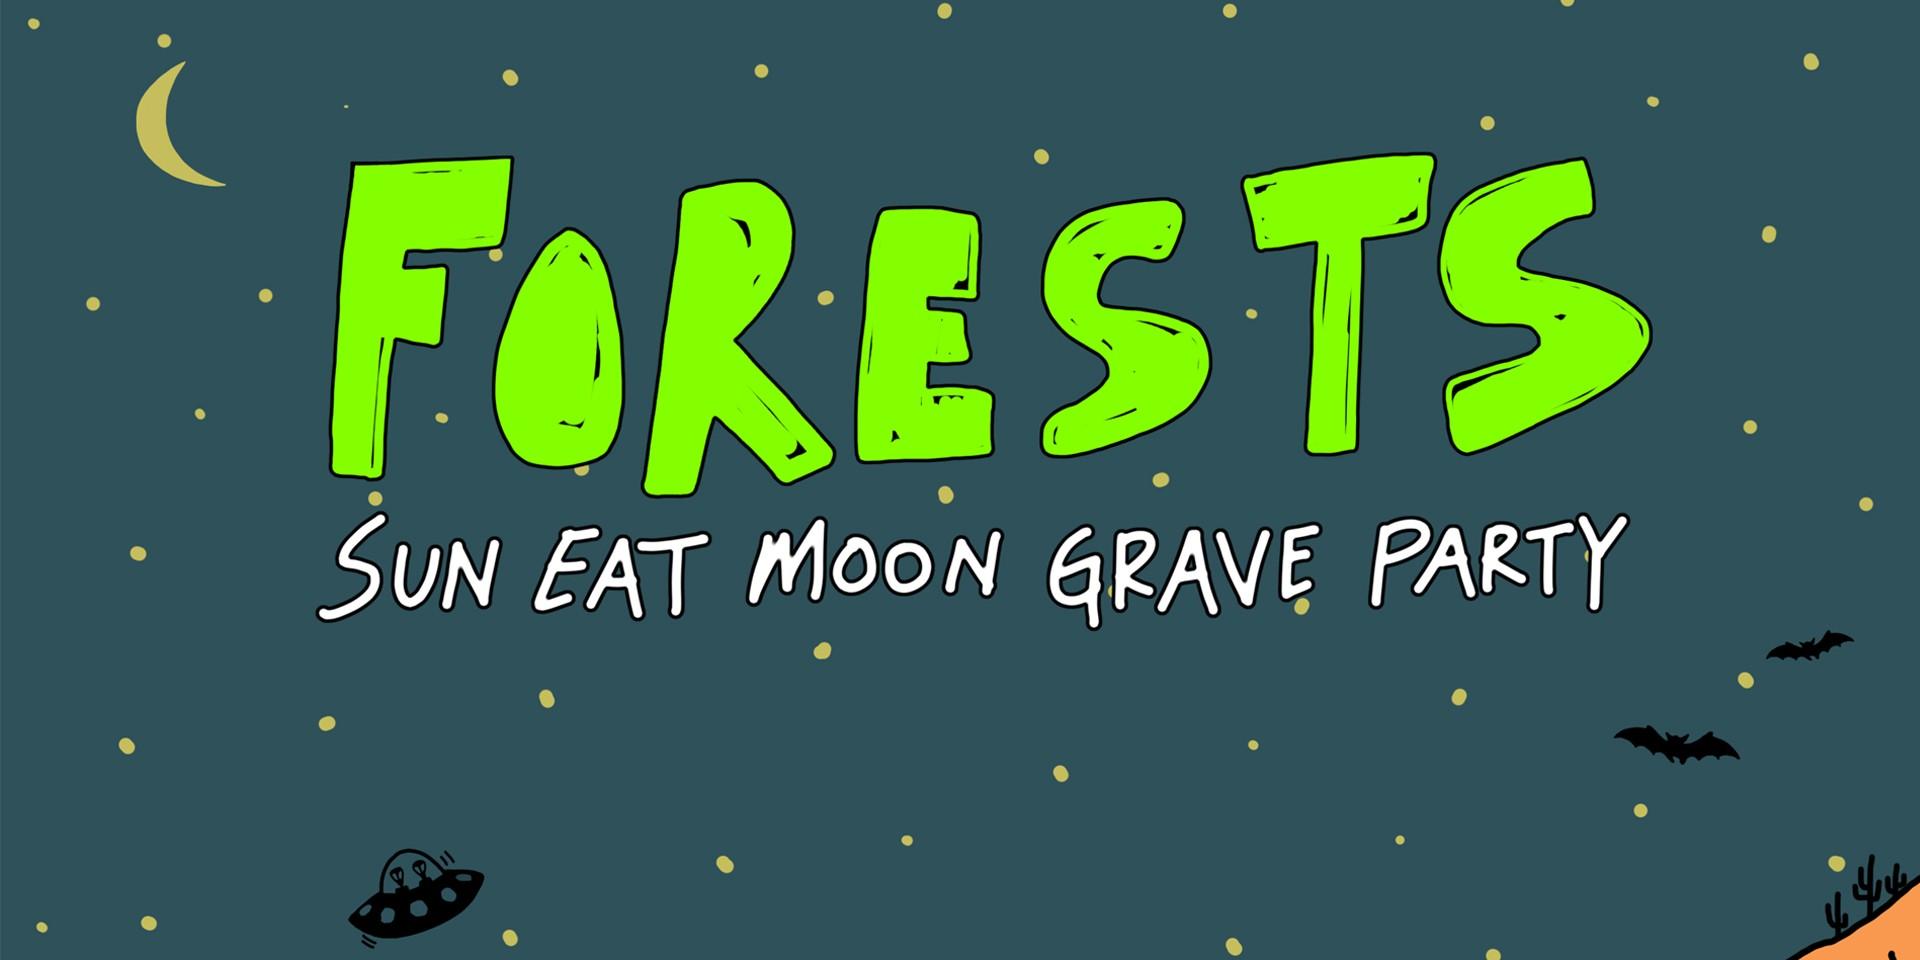 Stream Forests' wonderful sad rave album, Sun Eat Moon Grave Party